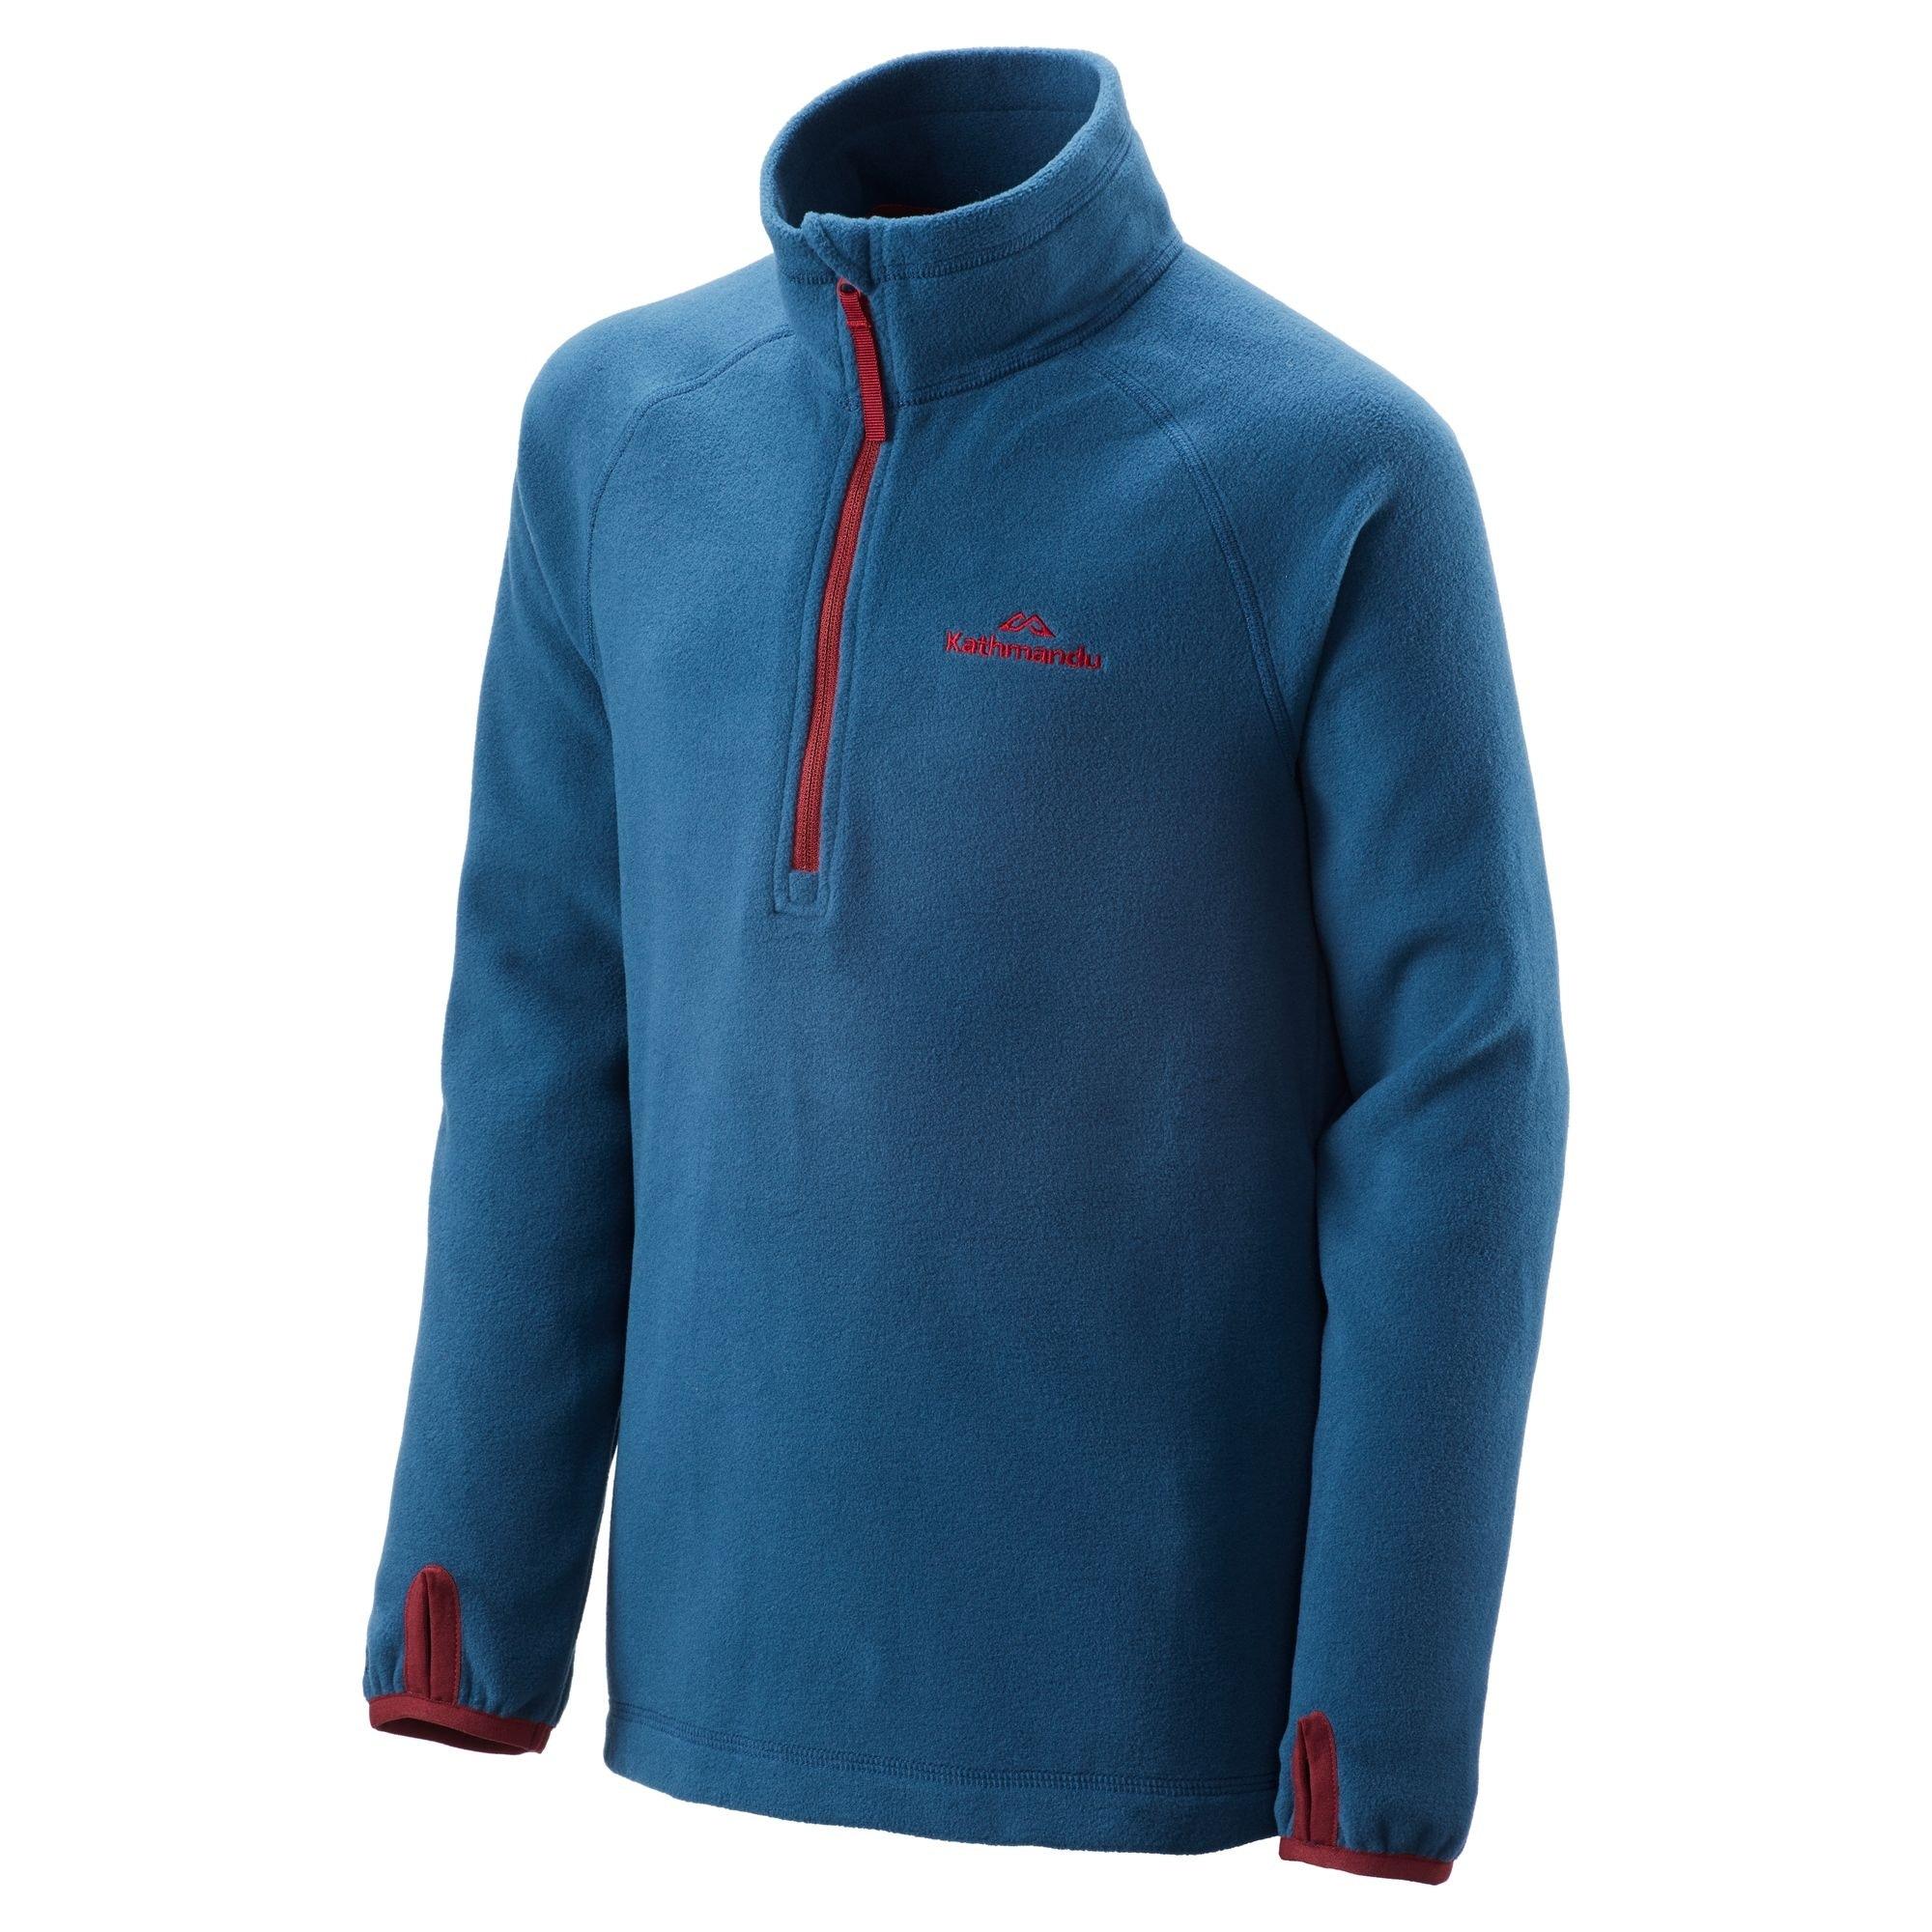 NEW-Kathmandu-Ridge-Kids-039-Girls-039-Boys-039-Warm-Fleece-Jacket-1-4-Zip-Pullover-Top thumbnail 22